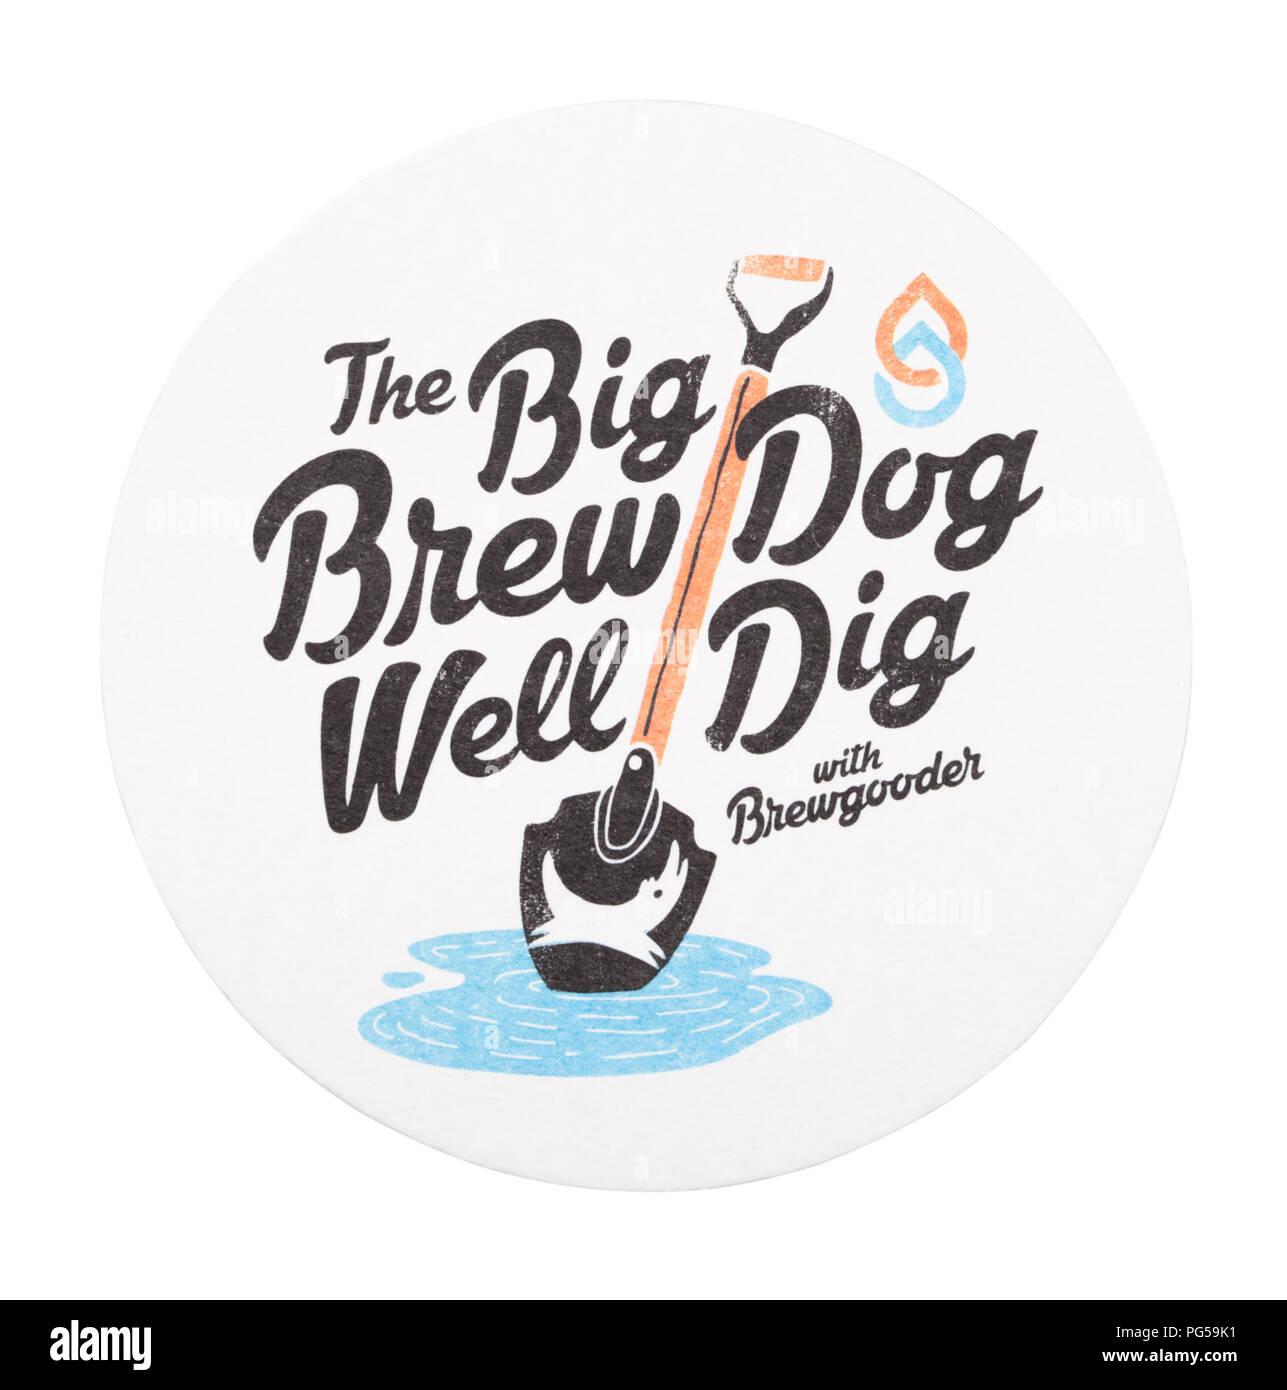 LONDON, UK - AUGUST 22, 2018: Brewdog paper beer beermat coaster isolated on white background. - Stock Image